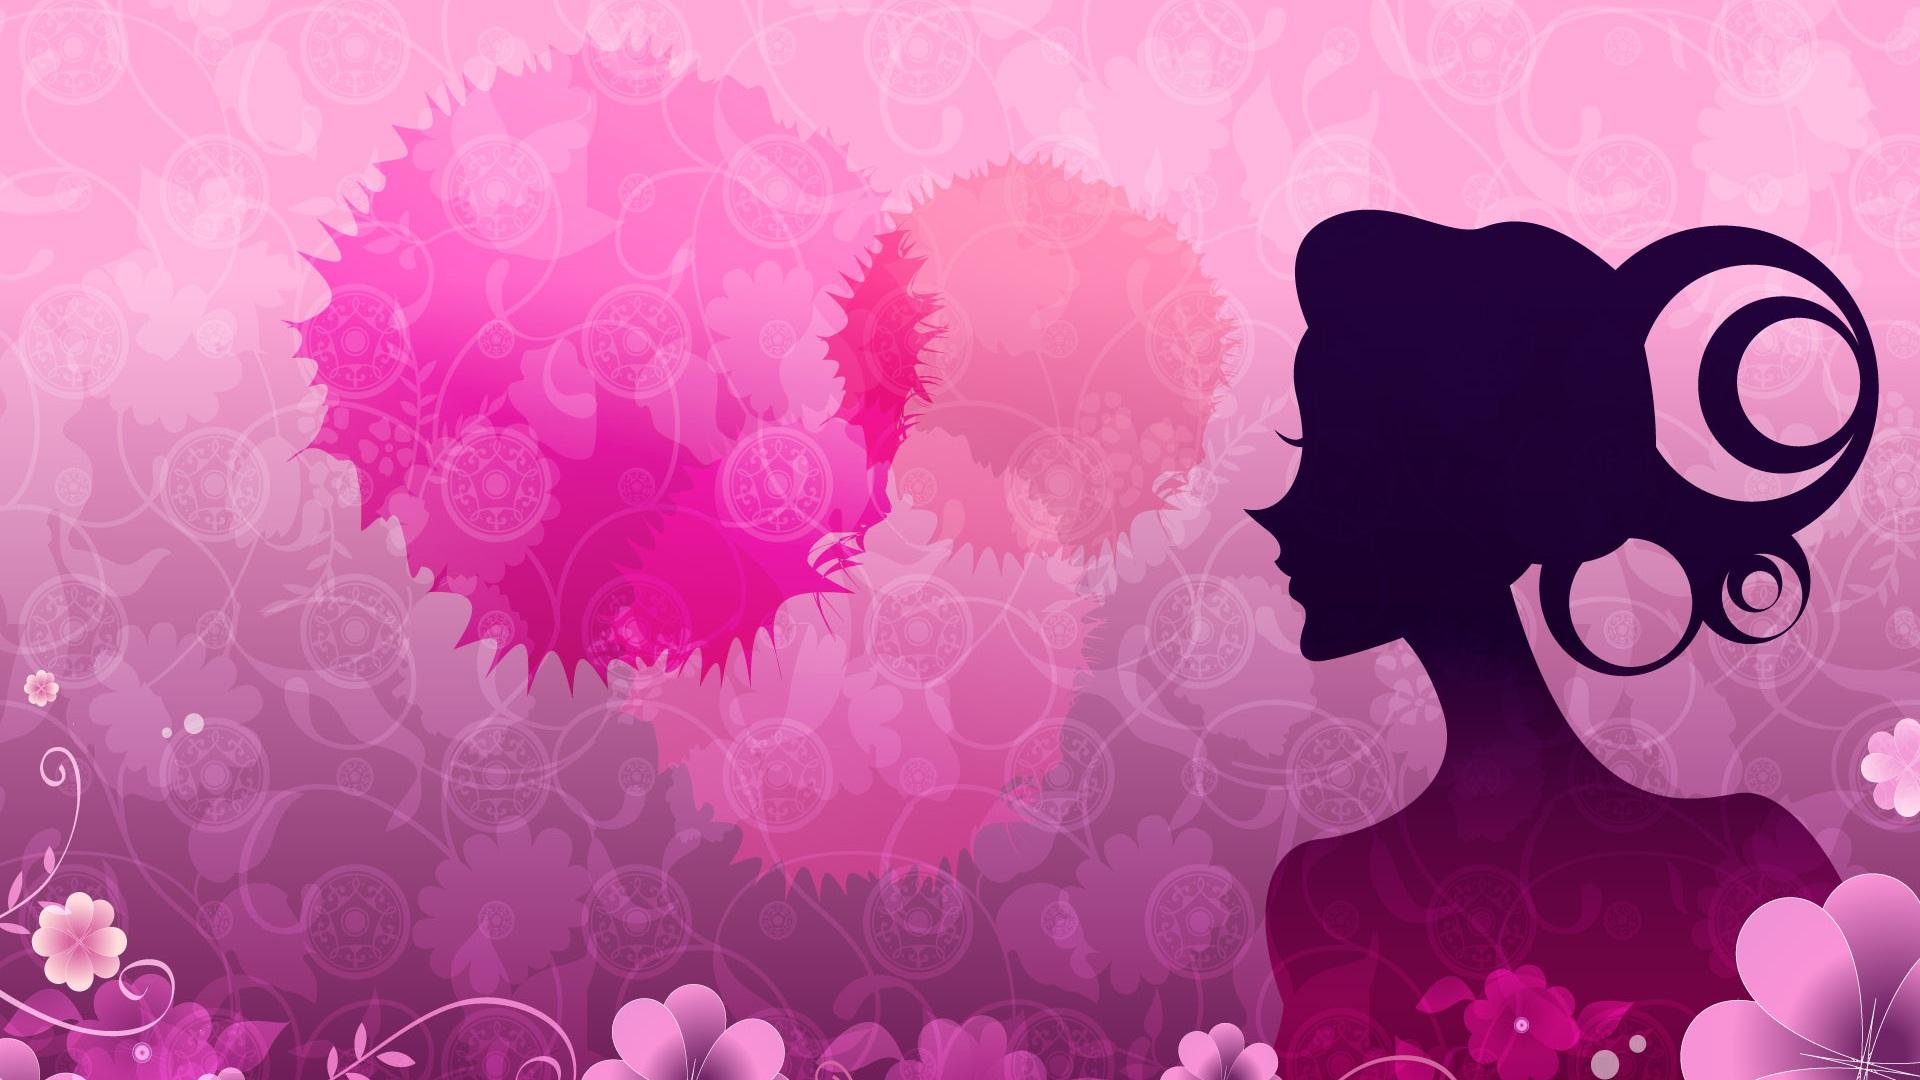 Inspirational girly desktop backgrounds tumblr for Tumblr inspirational wallpaper